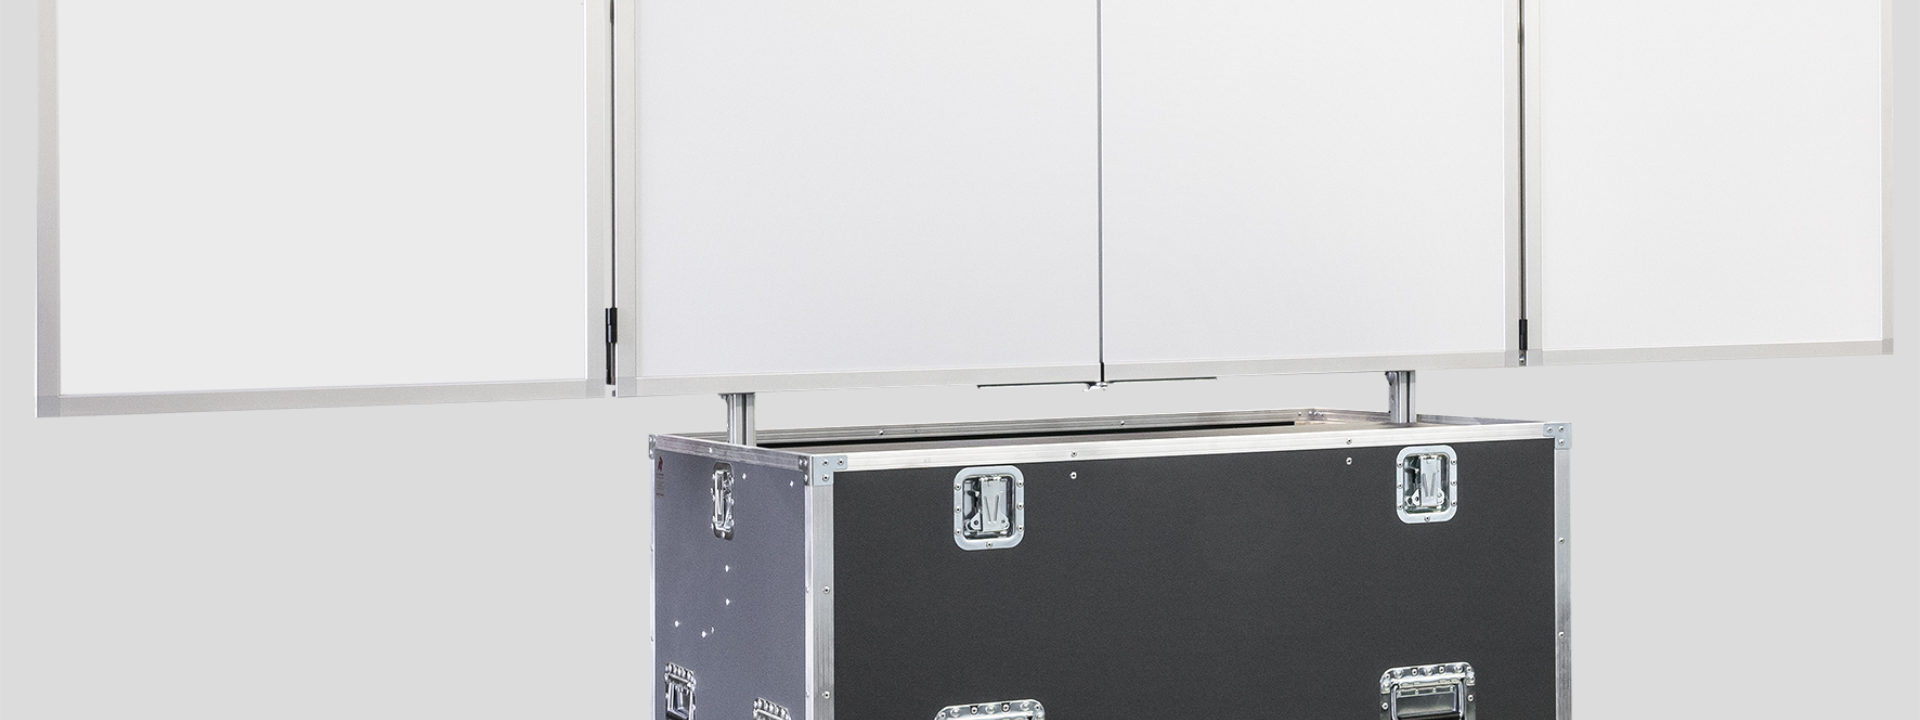 Klapptafel-Rollcontainer